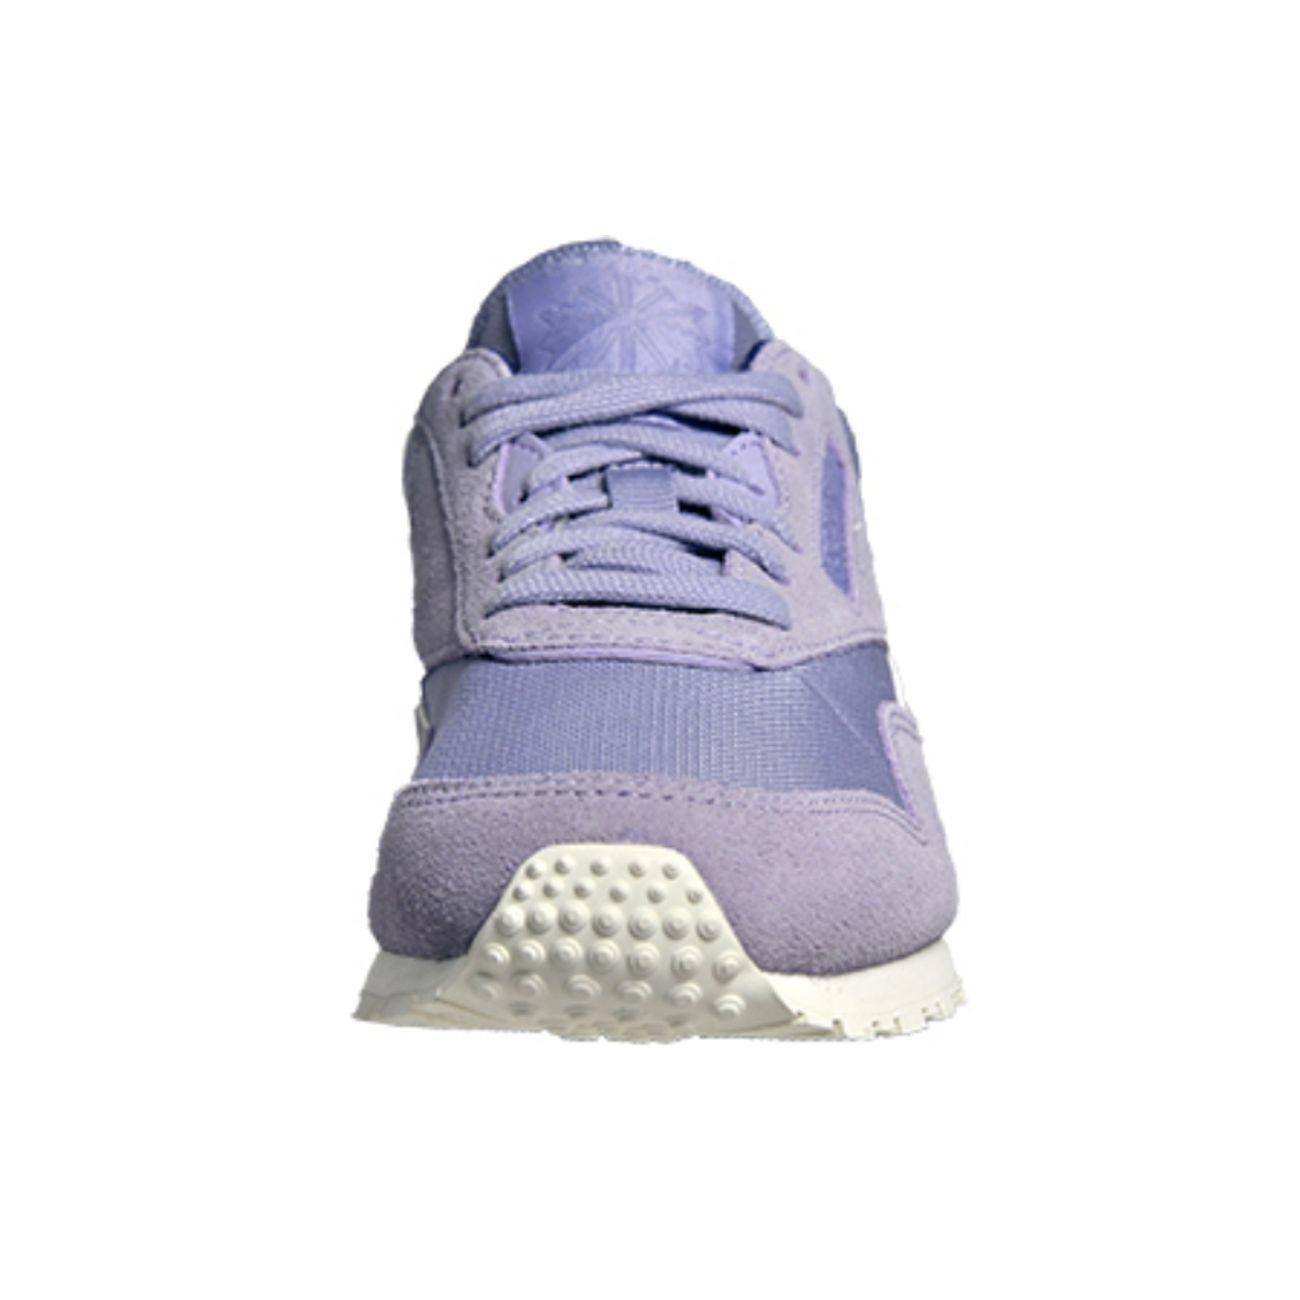 Et Violet Bodcxe Classic Nylon – F Baskets Pas V68403 Achat Reebok Prix m8ONn0wPyv